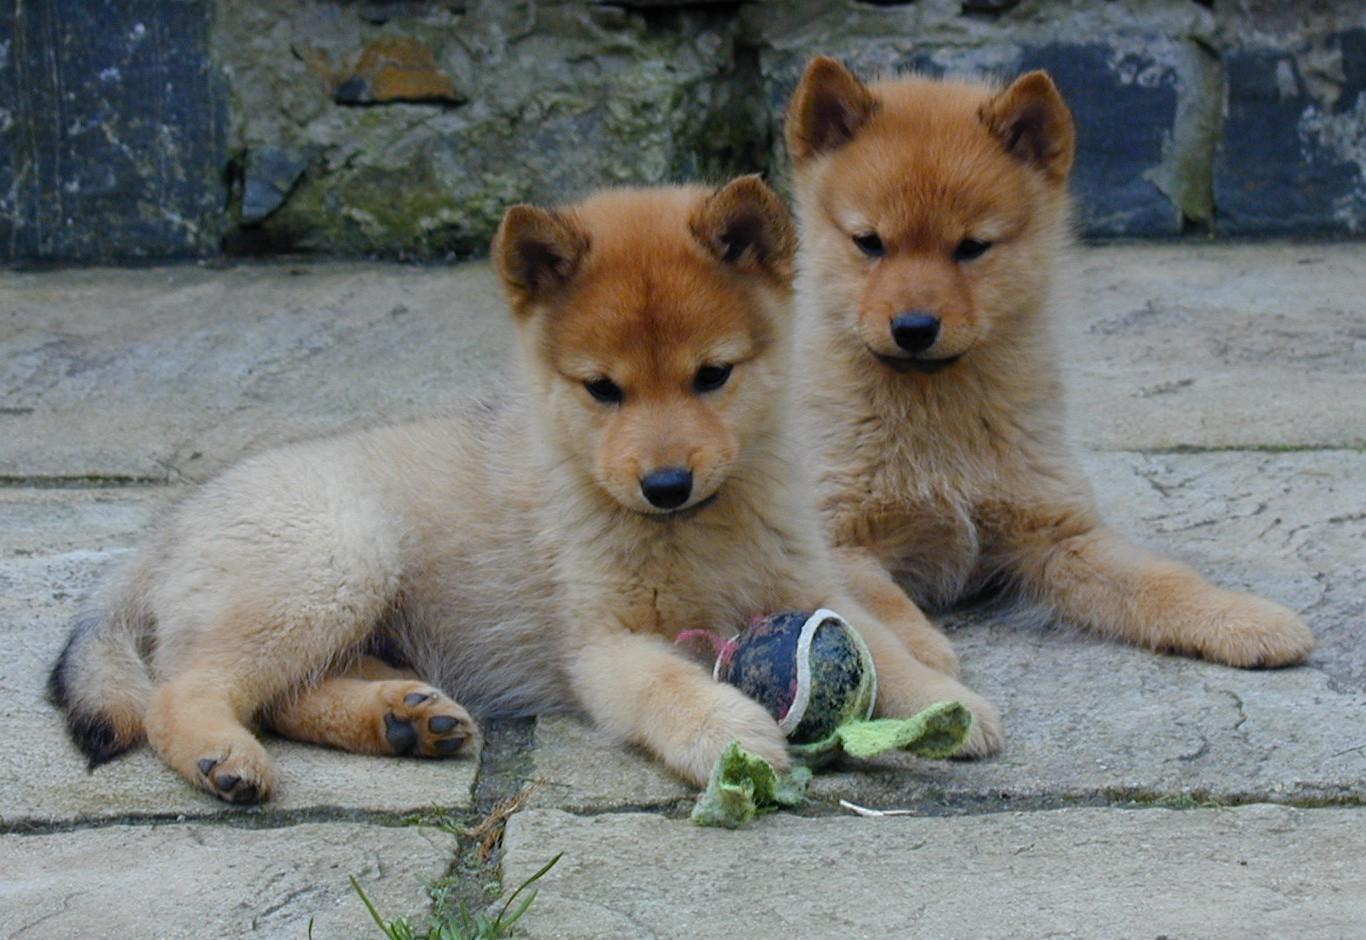 Cute Pomeranian Puppies Wallpaper Finnish Spitz Puppies Photo And Wallpaper Beautiful